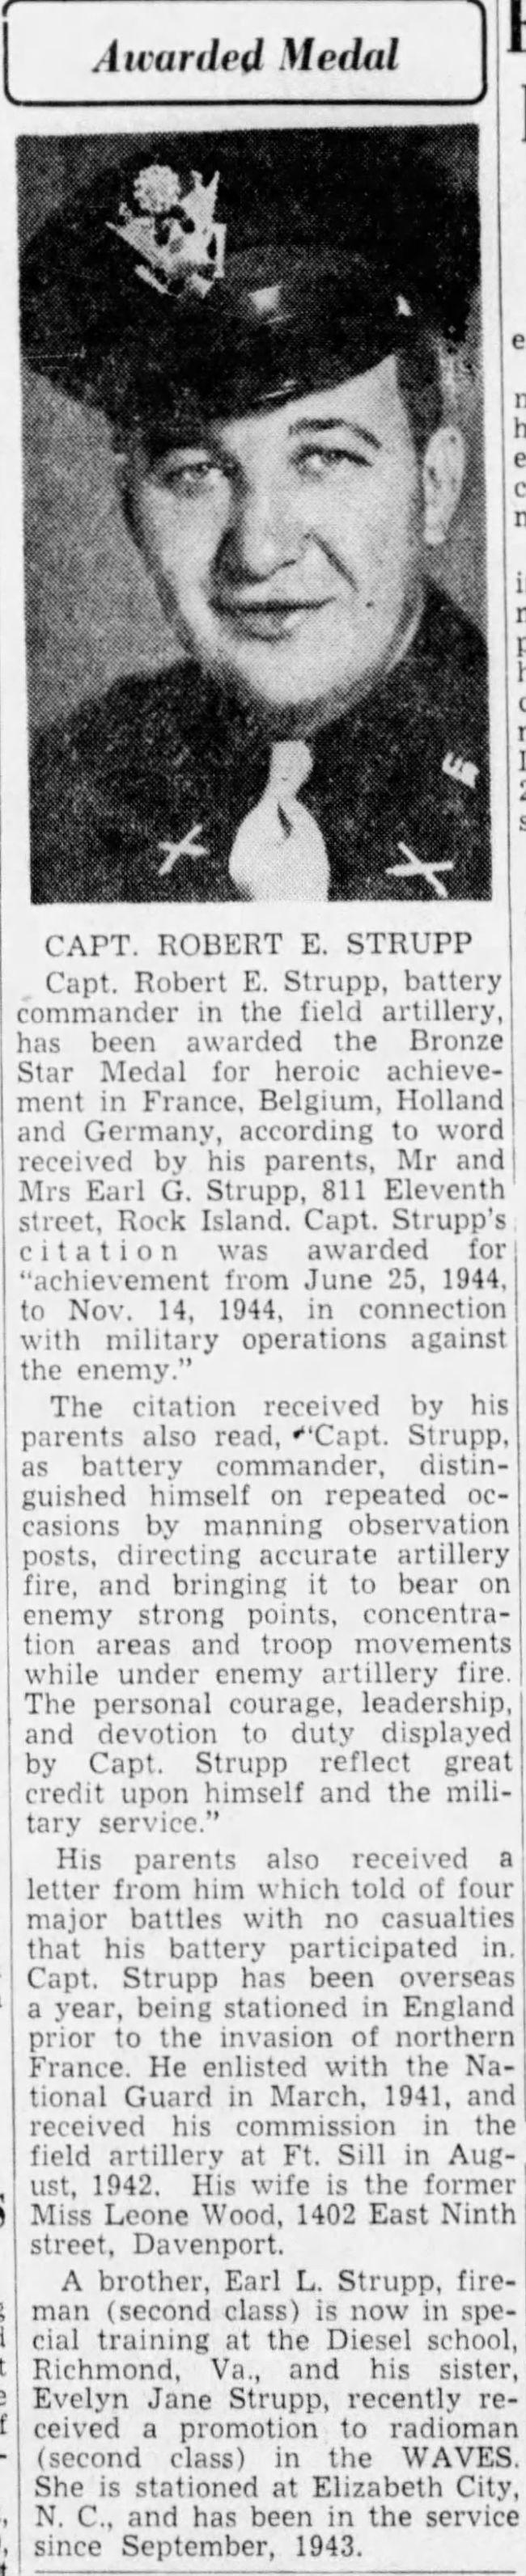 Robert E. Strupp awarded the Bronze Star